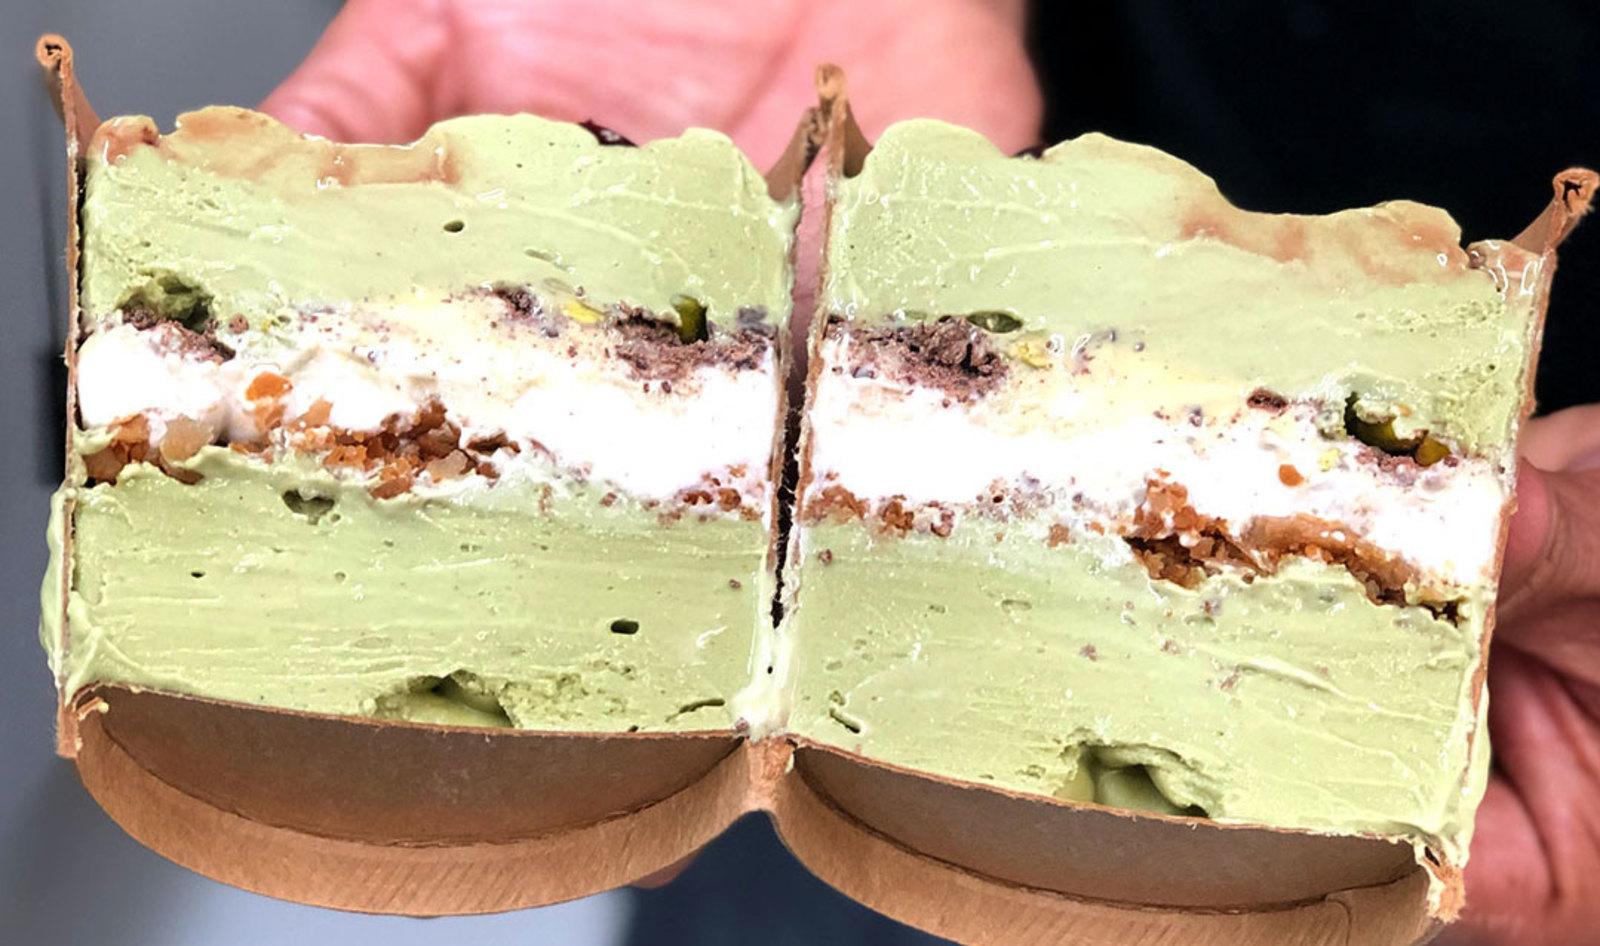 Vegan Chef Matthew Kenney Just Launched Dairy-Free Cannoli Ice Cream | VegNews